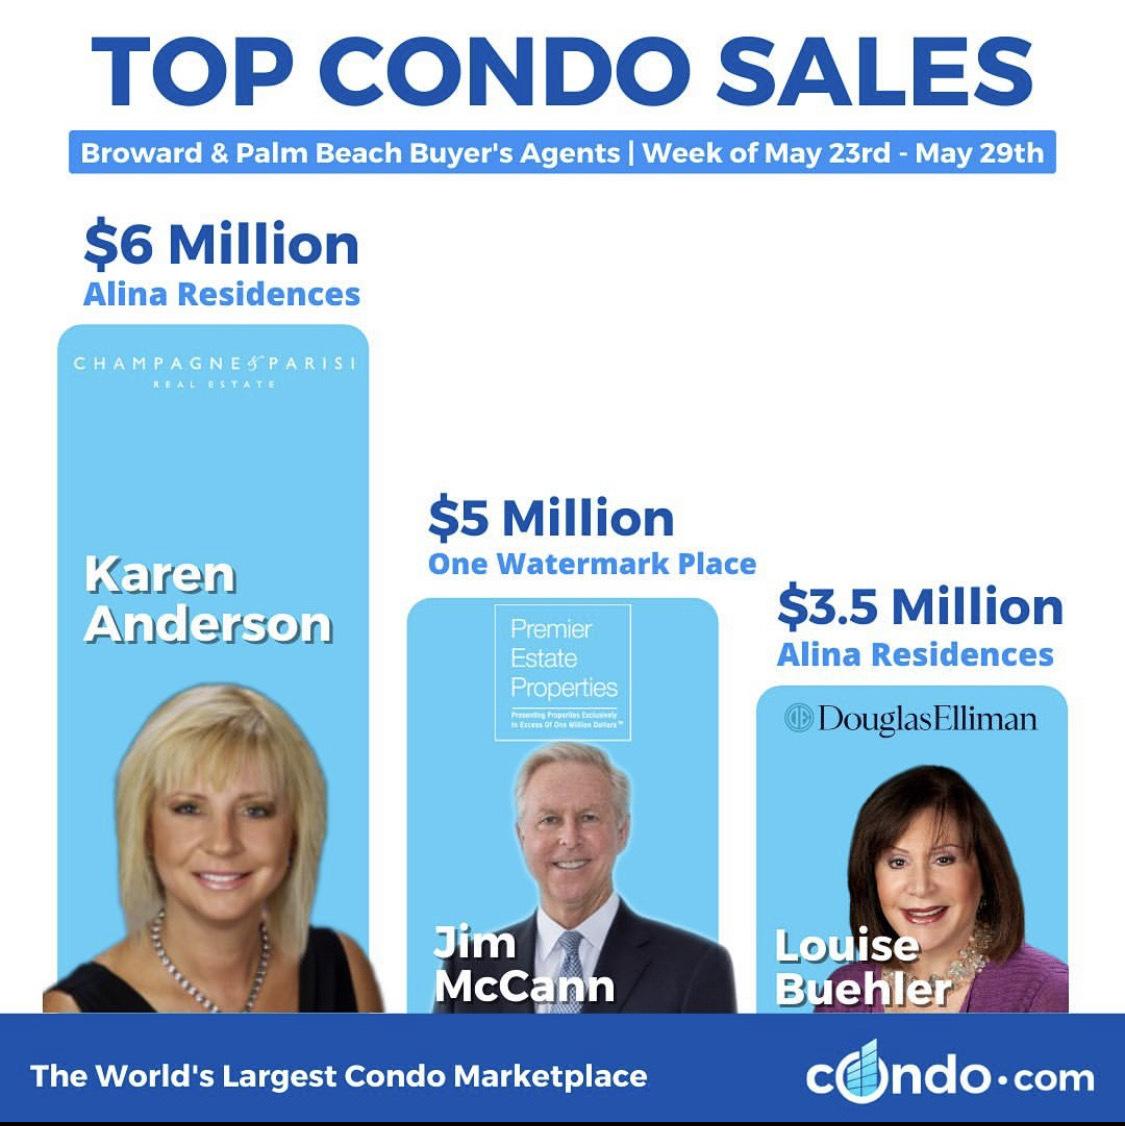 condo.com top sales south florida